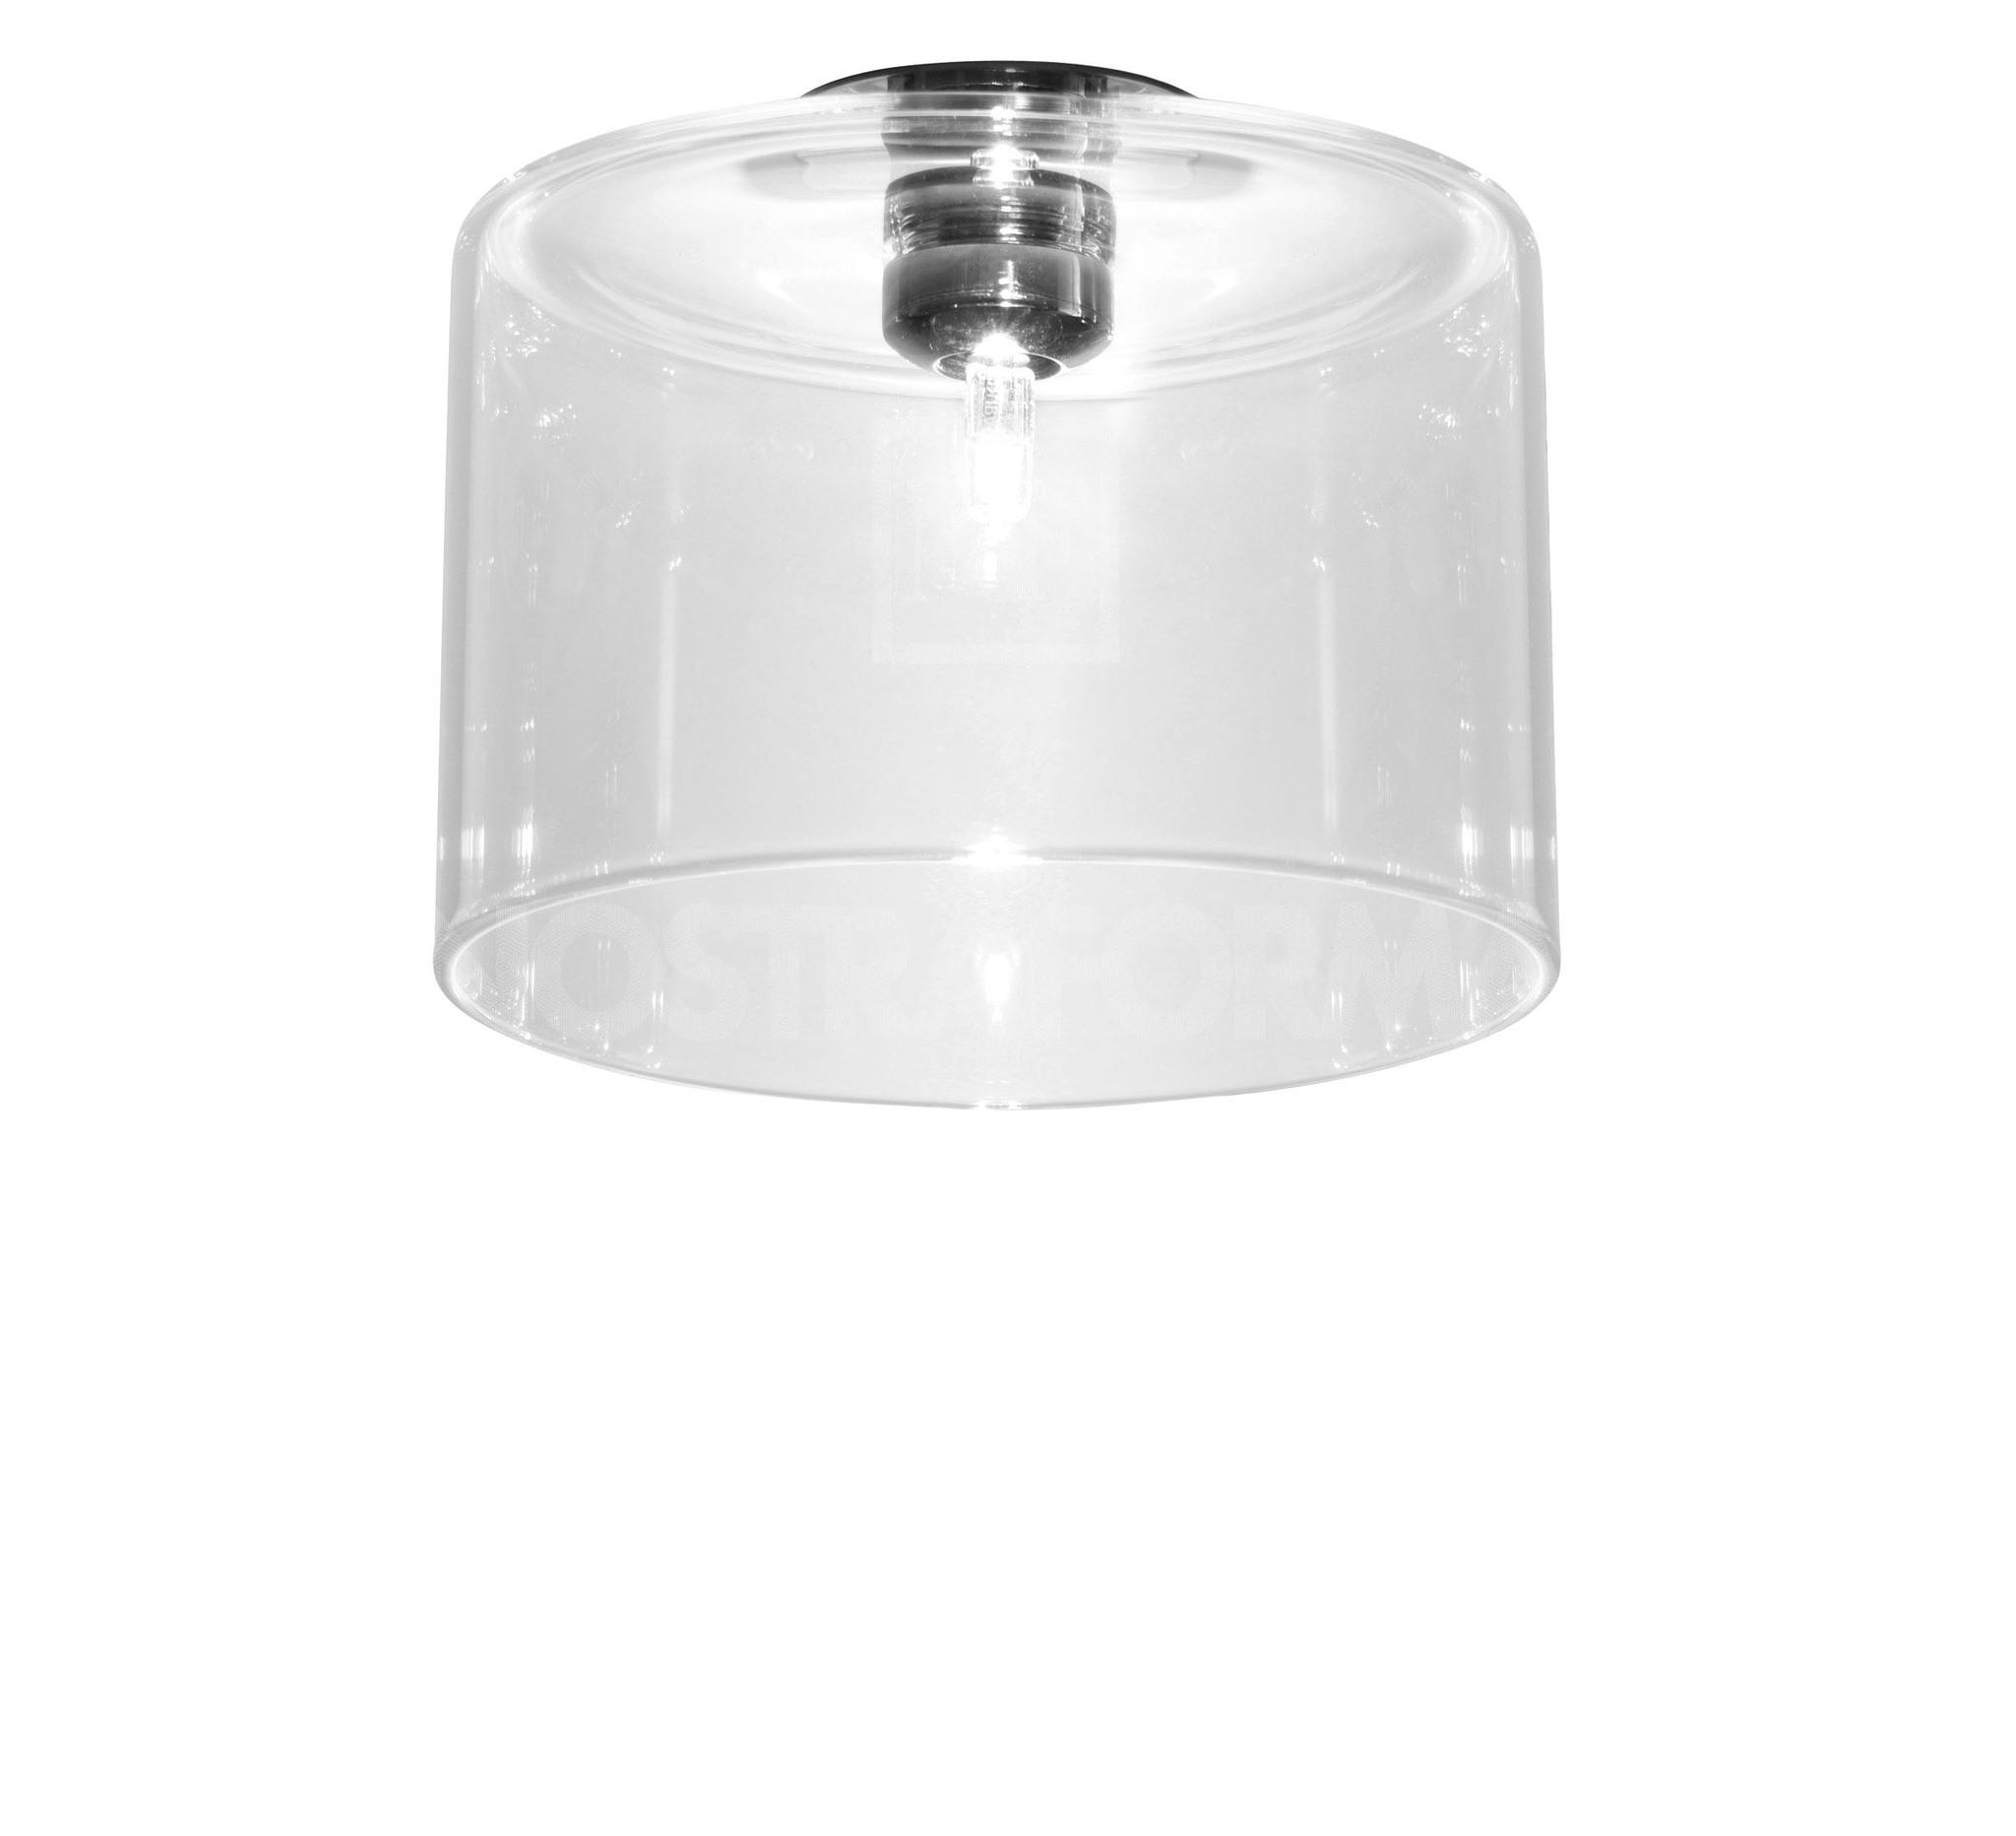 replica axo light spillray g1ceiling lamp. Black Bedroom Furniture Sets. Home Design Ideas